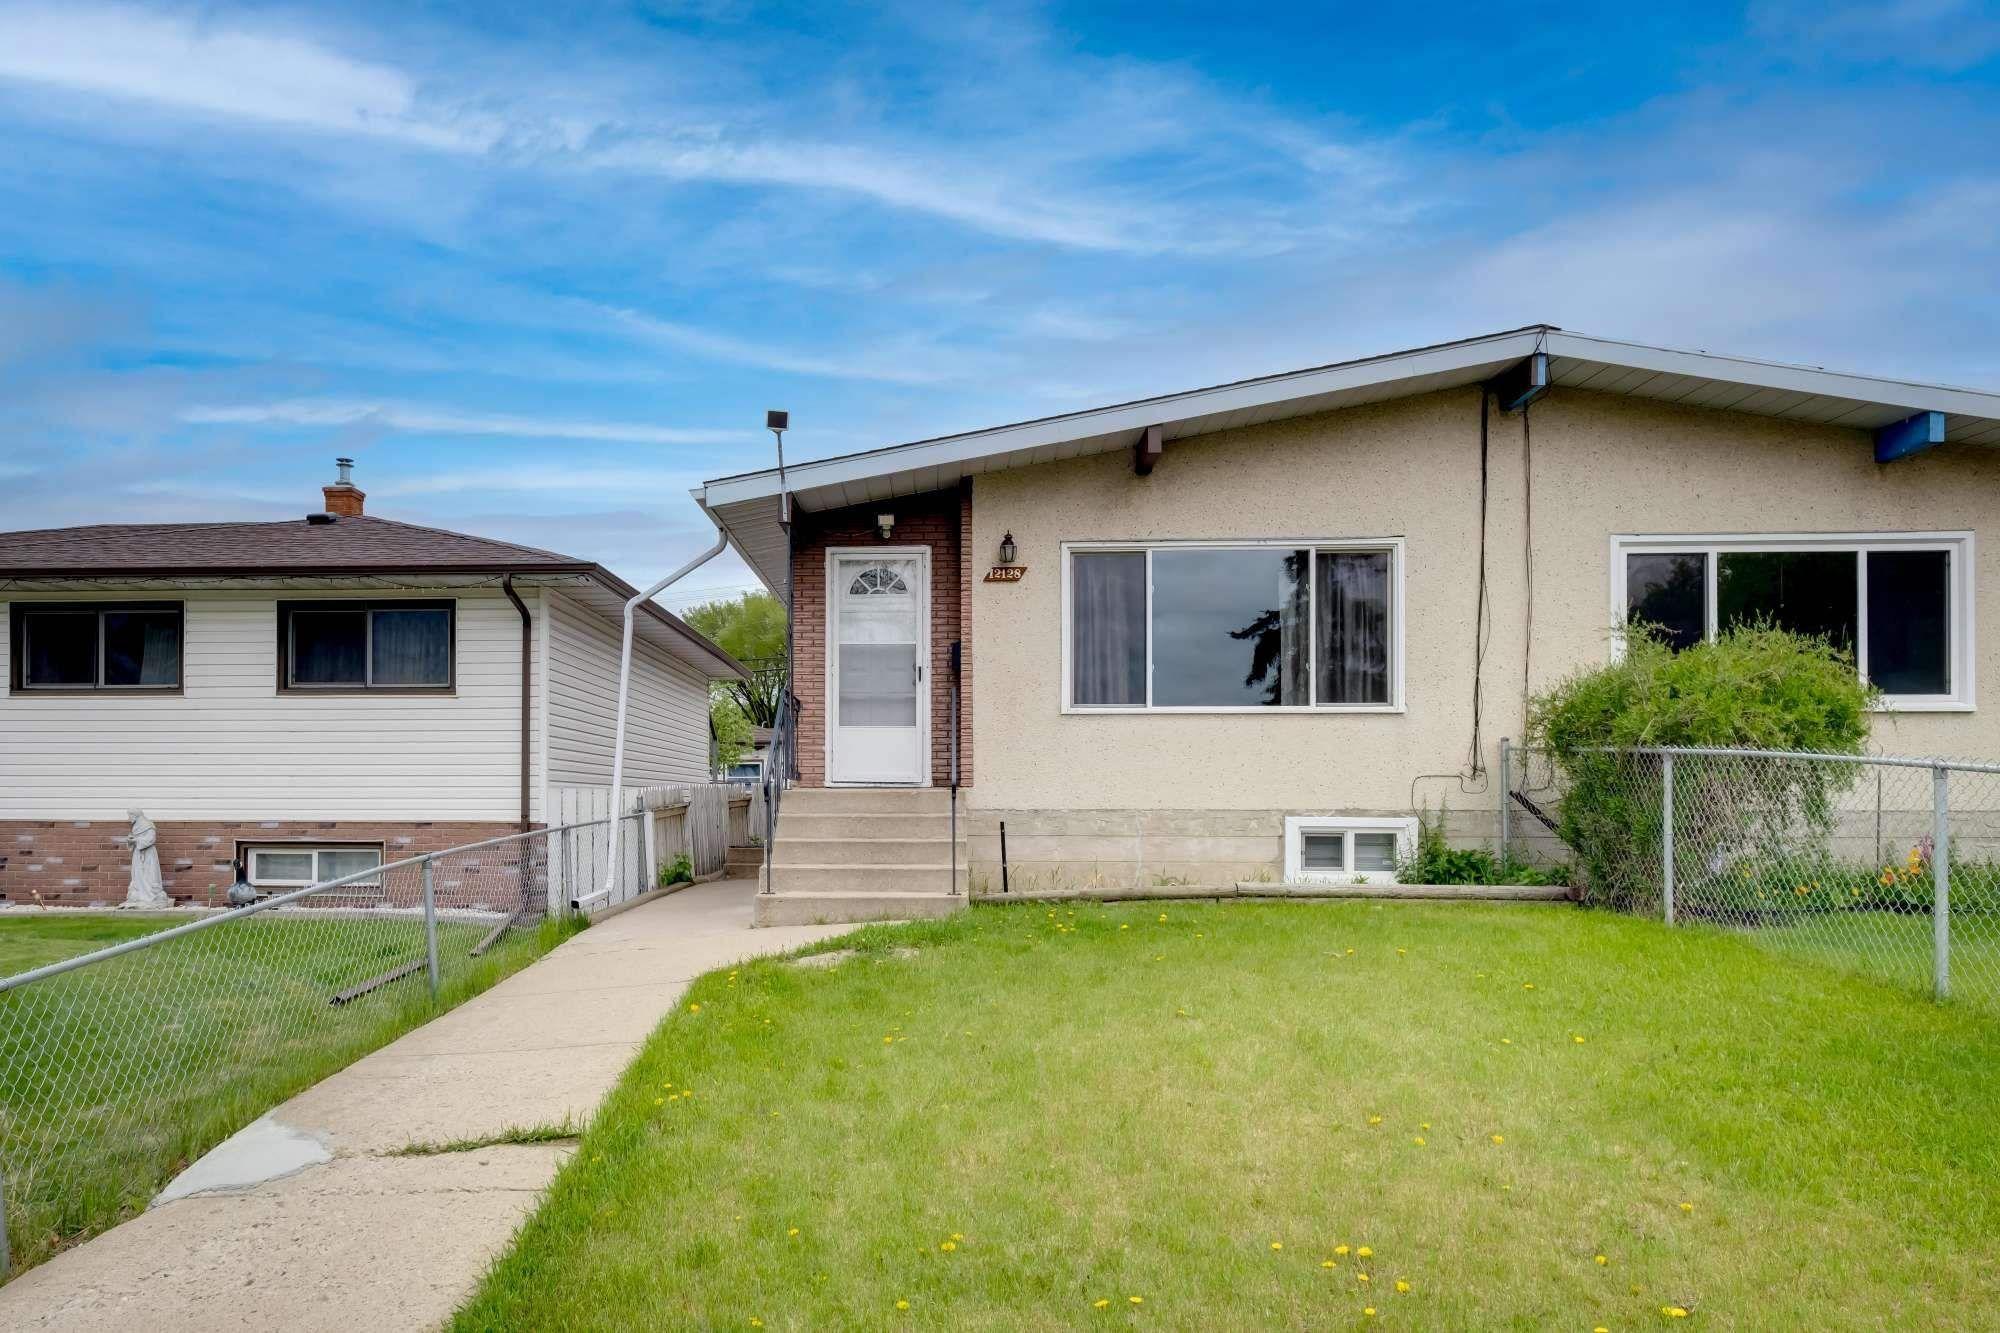 Main Photo: 12128 77 Street in Edmonton: Zone 05 House Half Duplex for sale : MLS®# E4247986